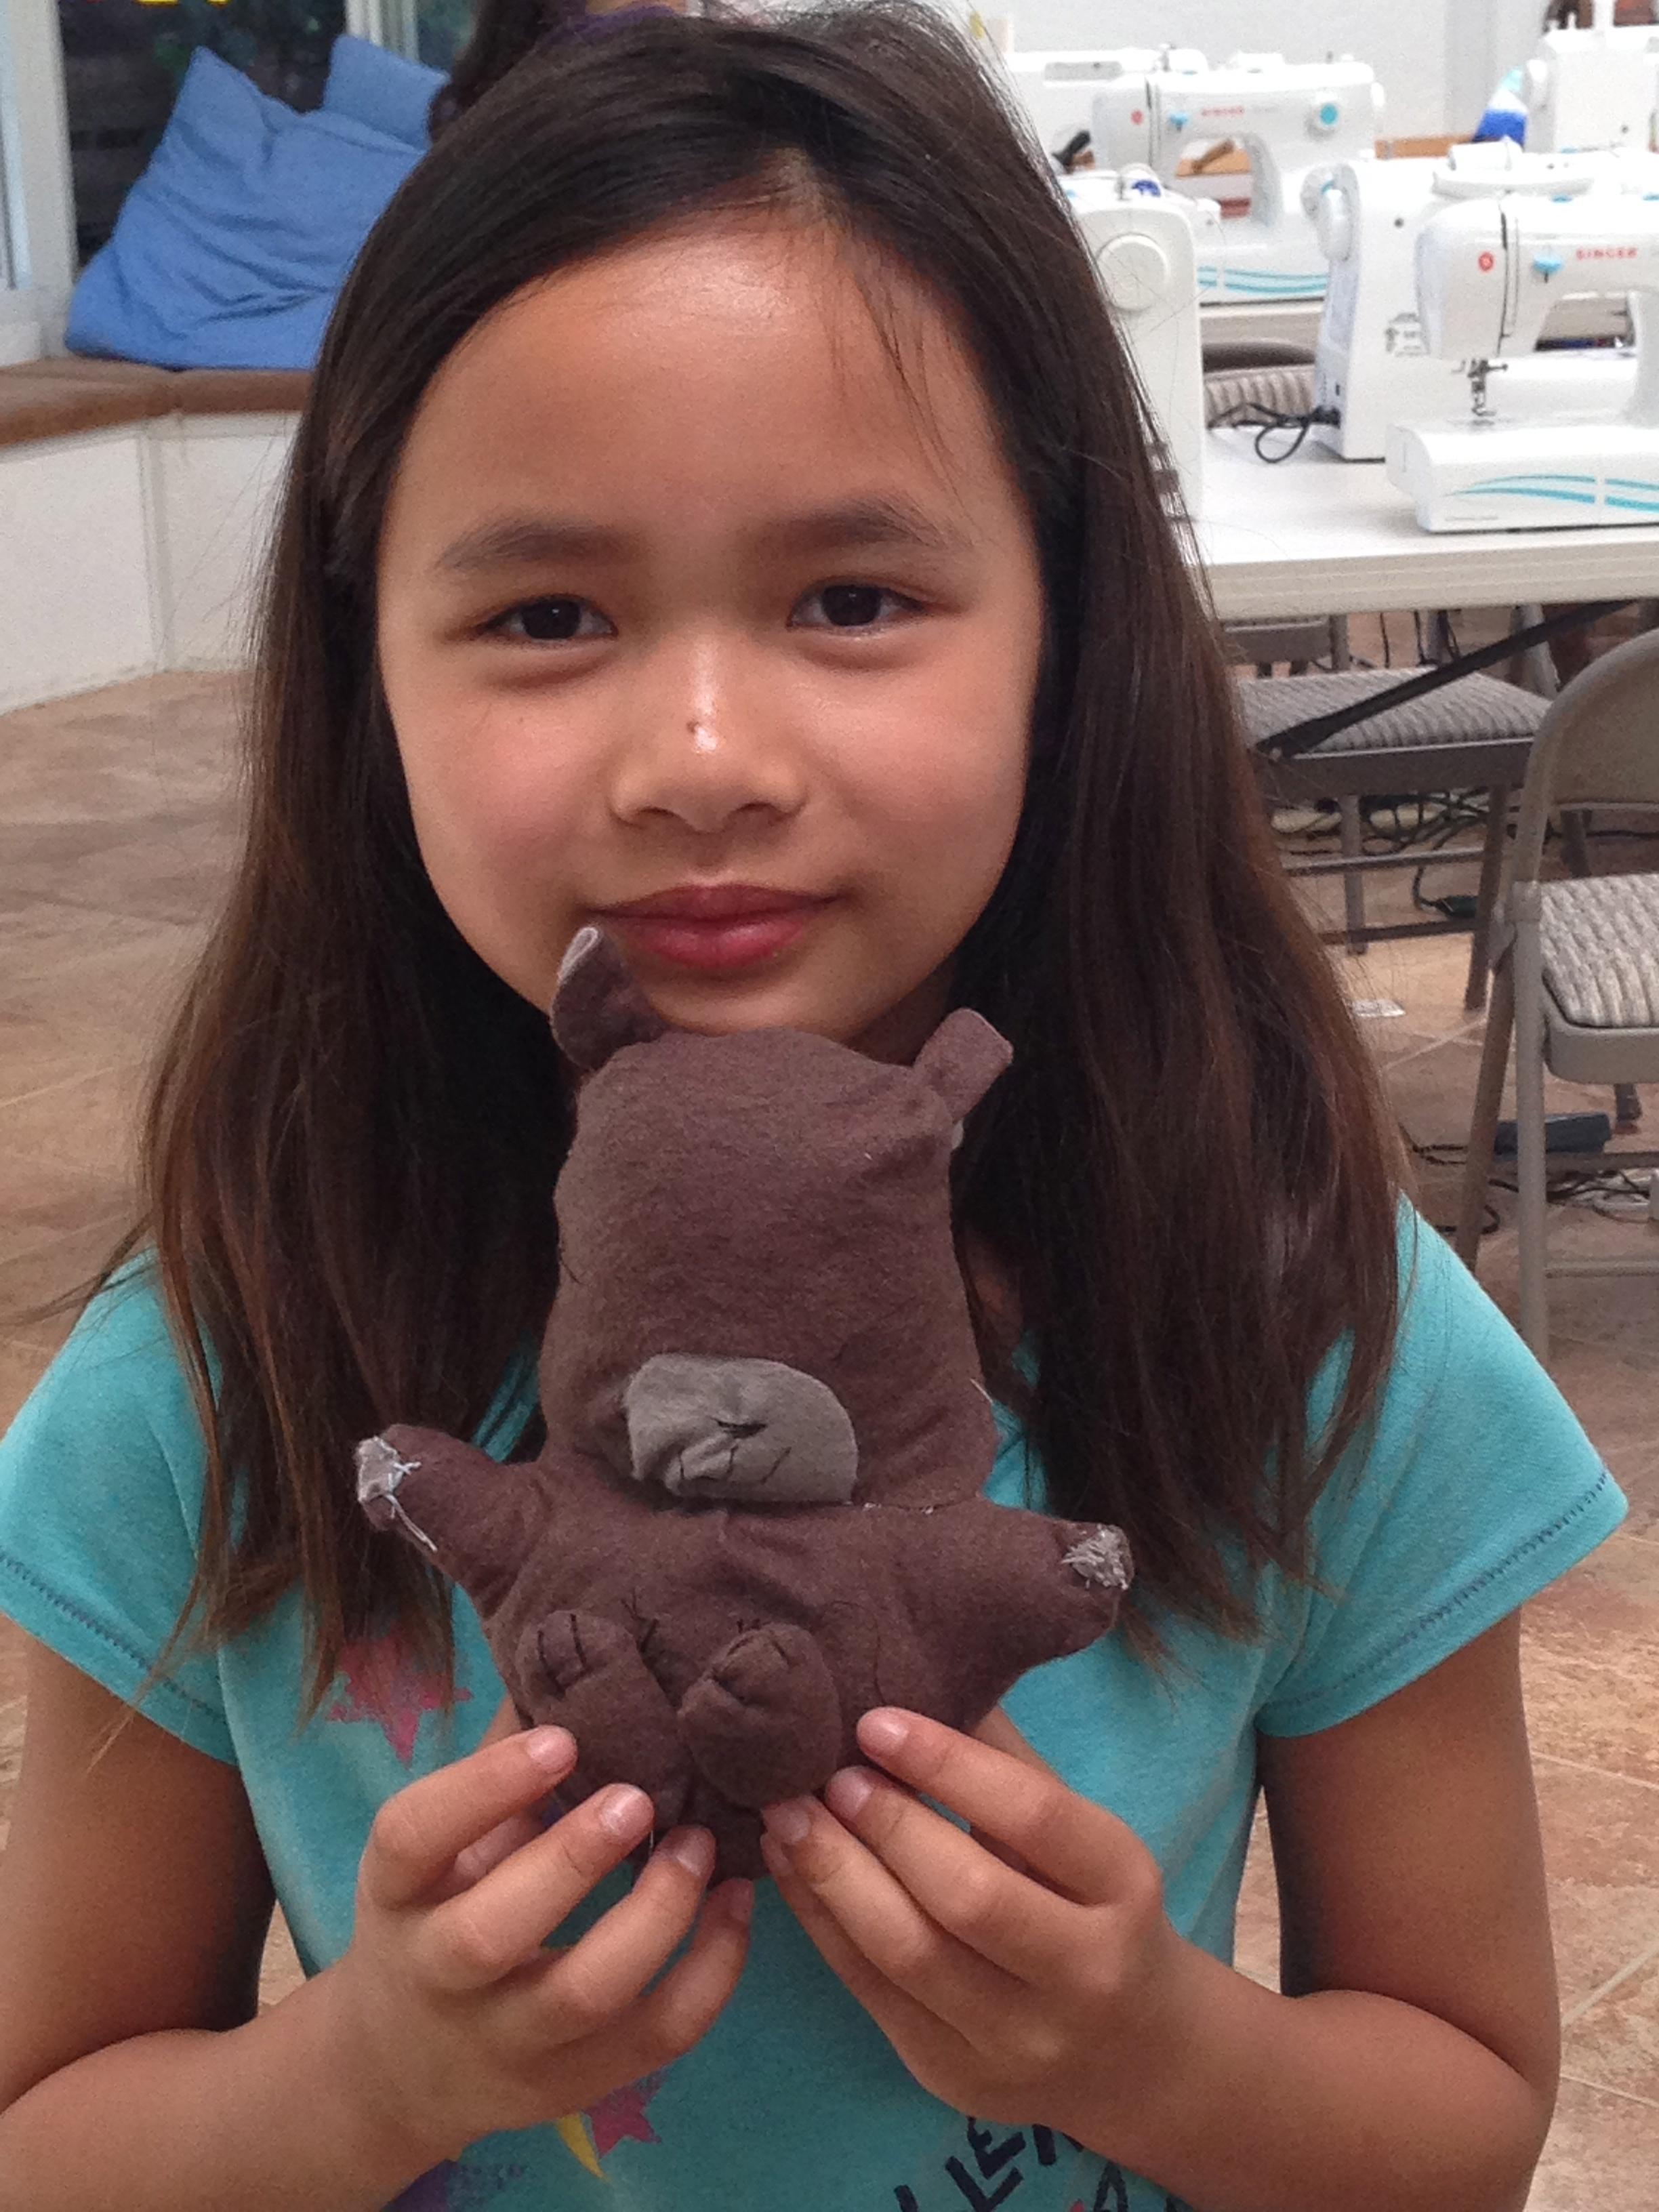 4th grader stuffed hamster.